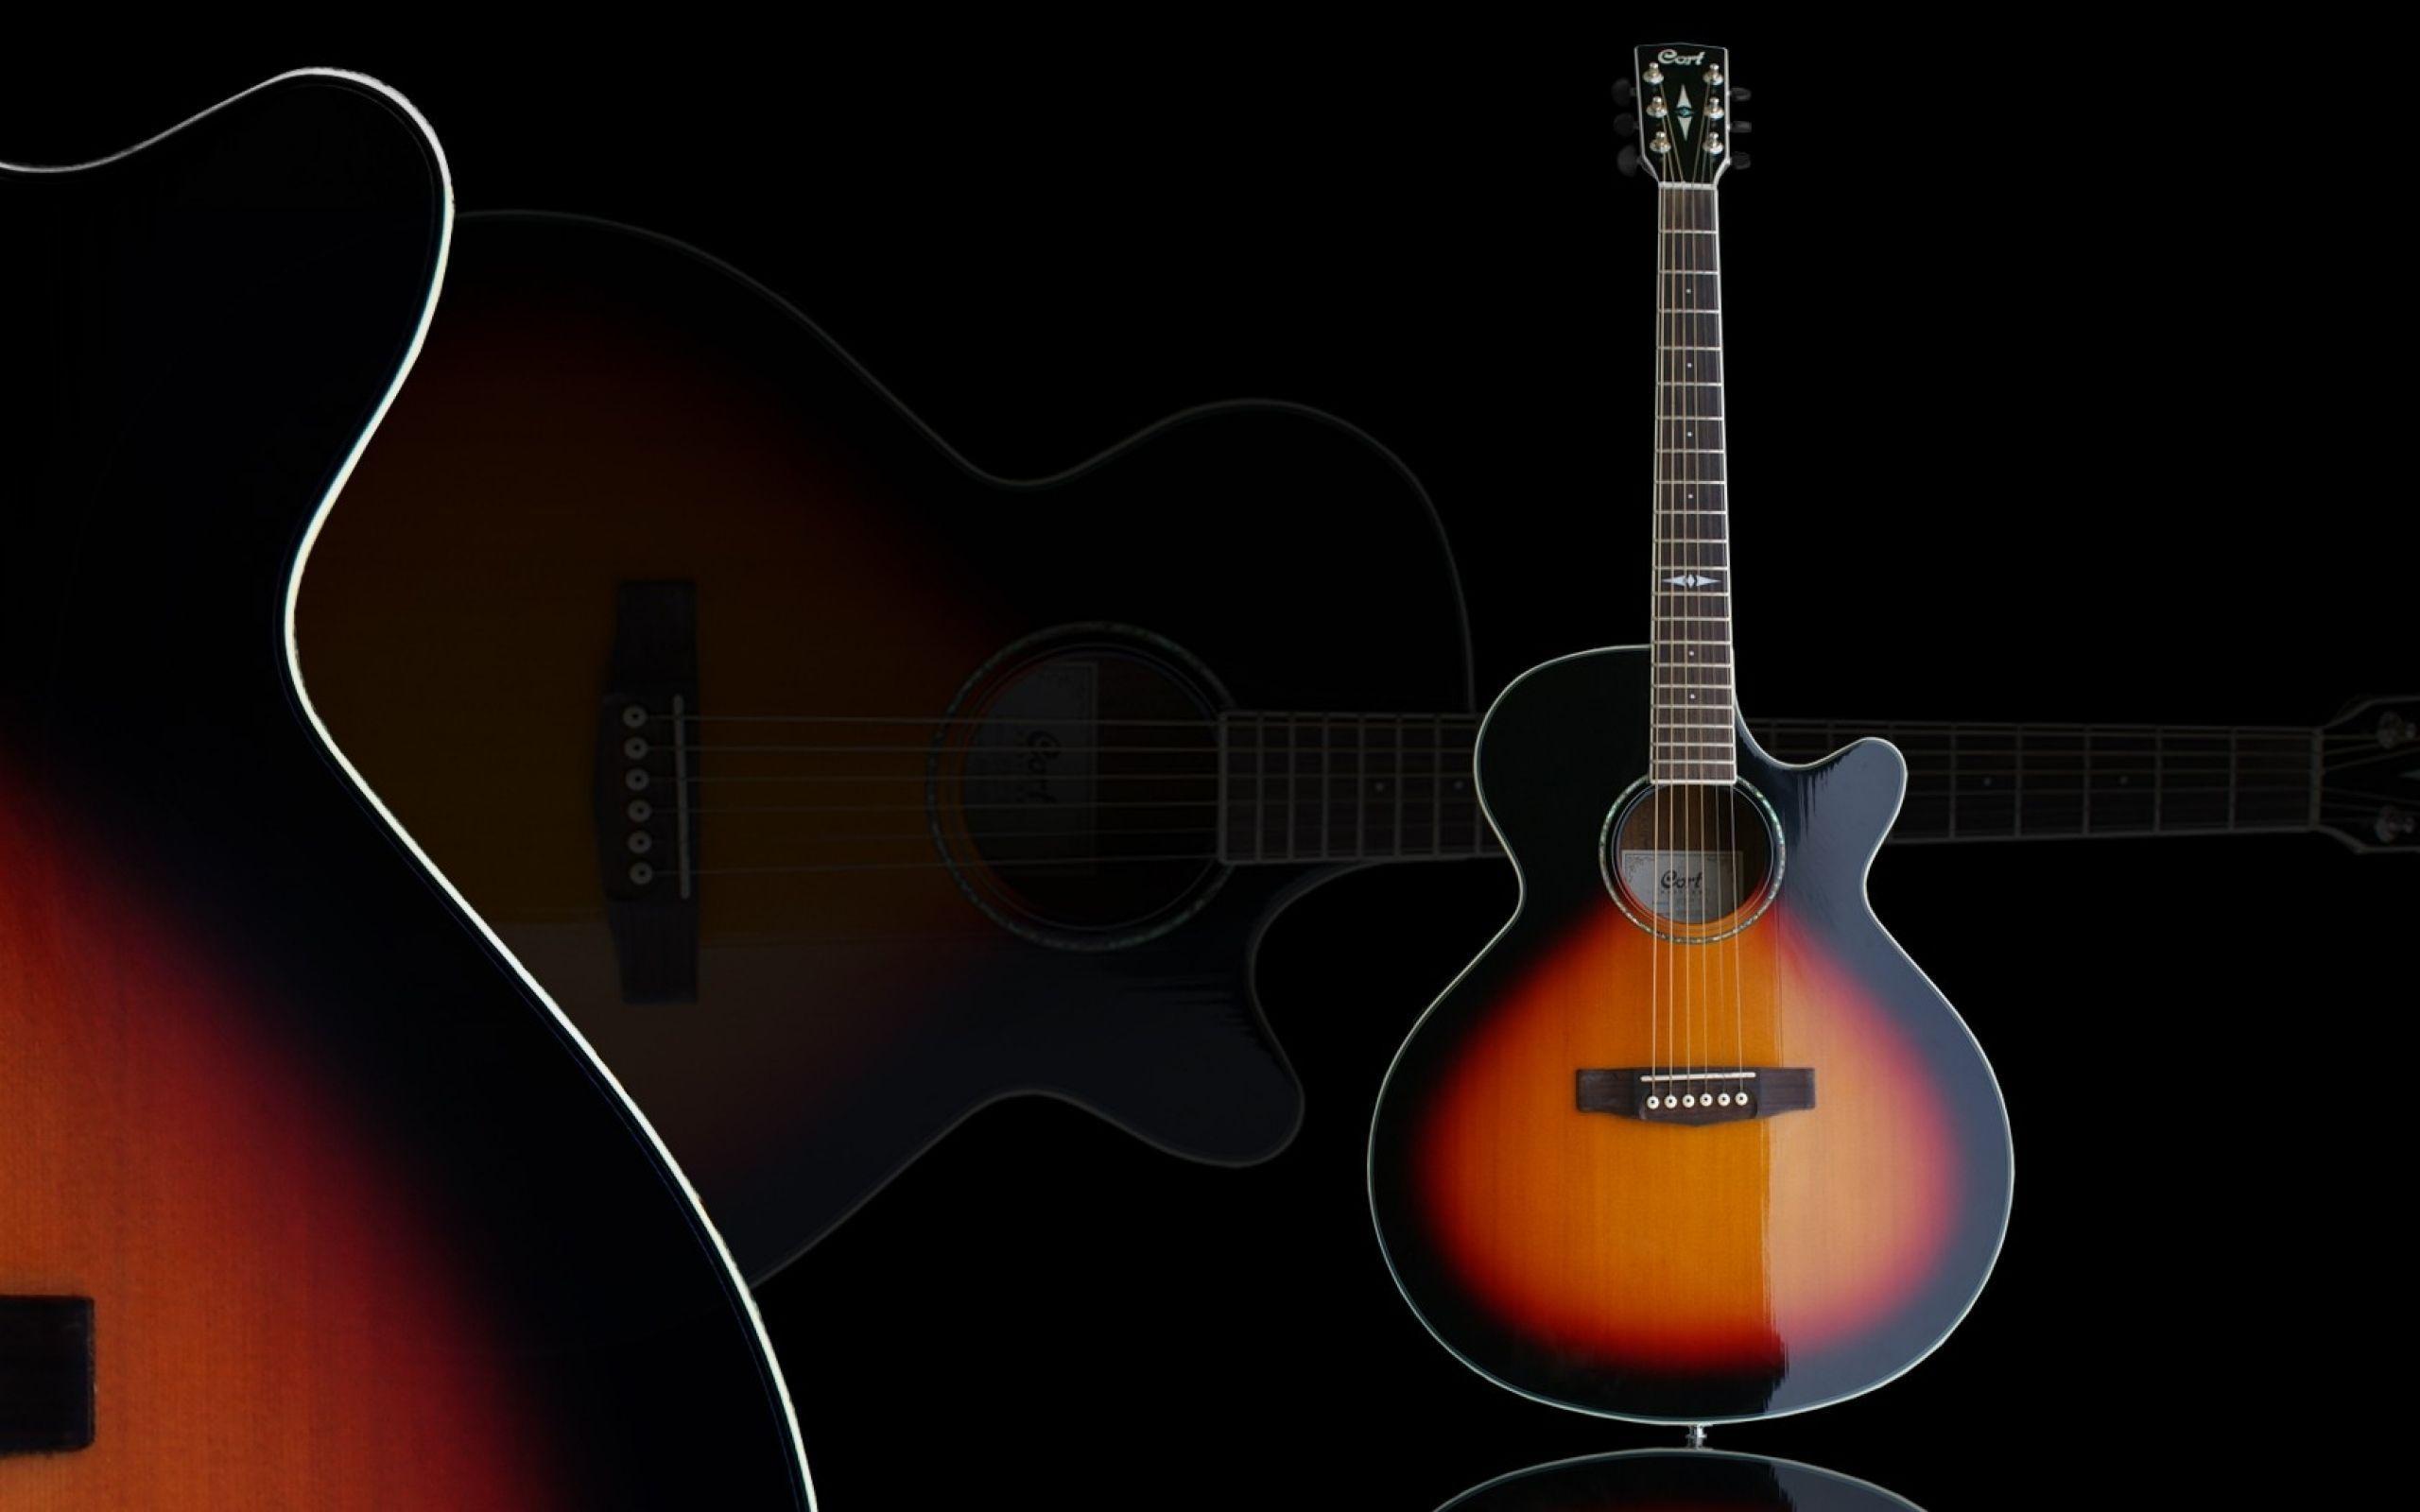 Acoustic Guitar Hd Wallpapers Wallpaper Cave